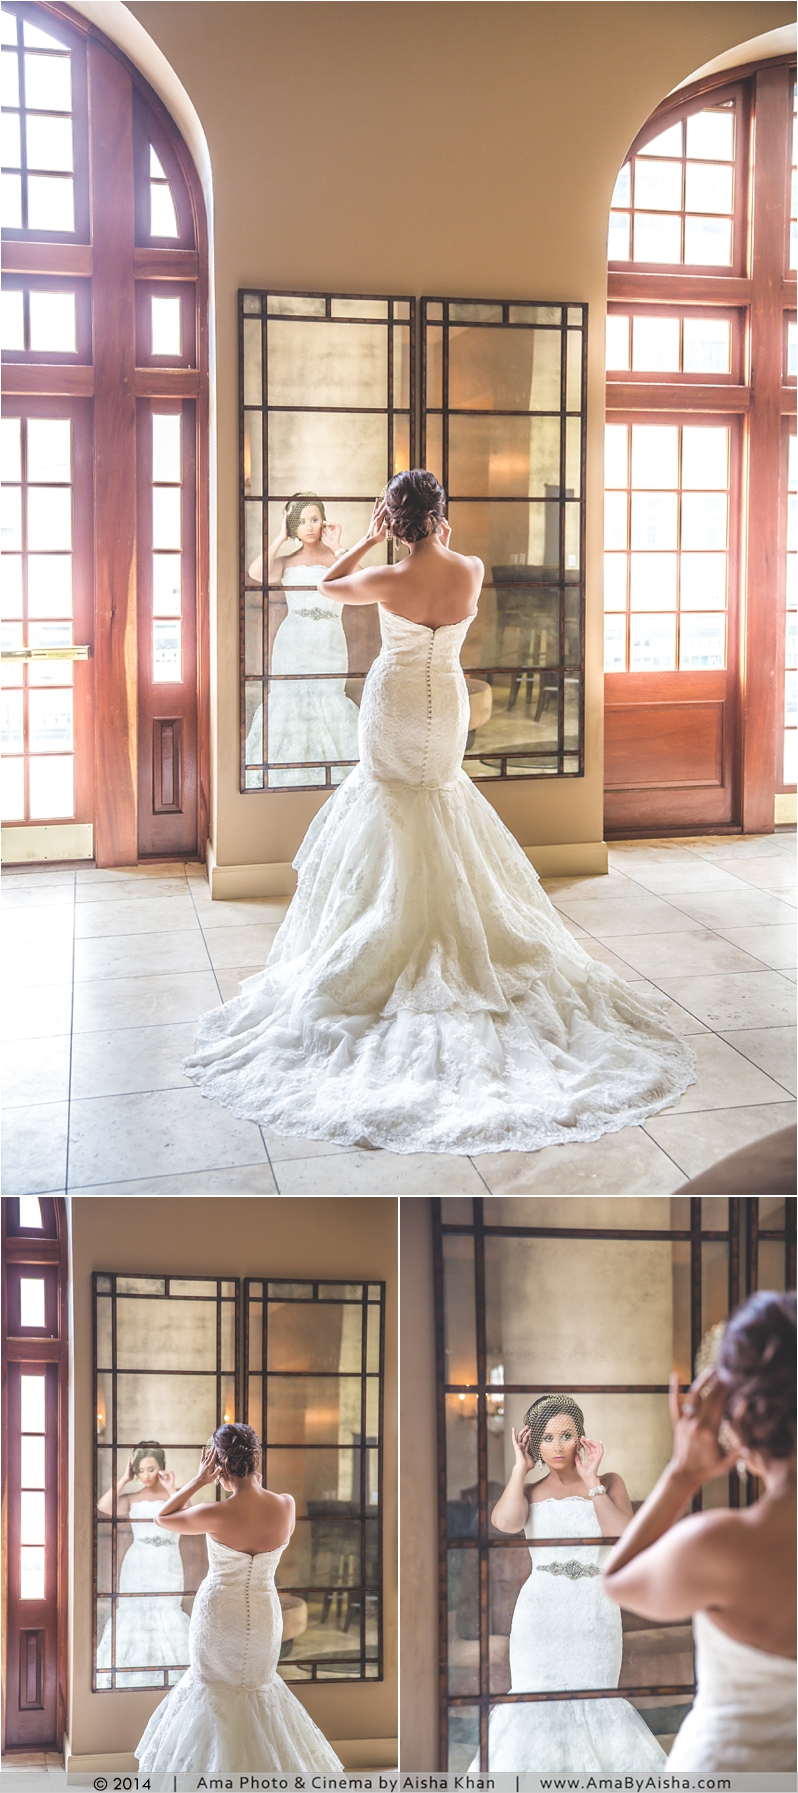 ©2014 | www.AmaByAisha.com | Crystal Ballroom Bridal Portraits